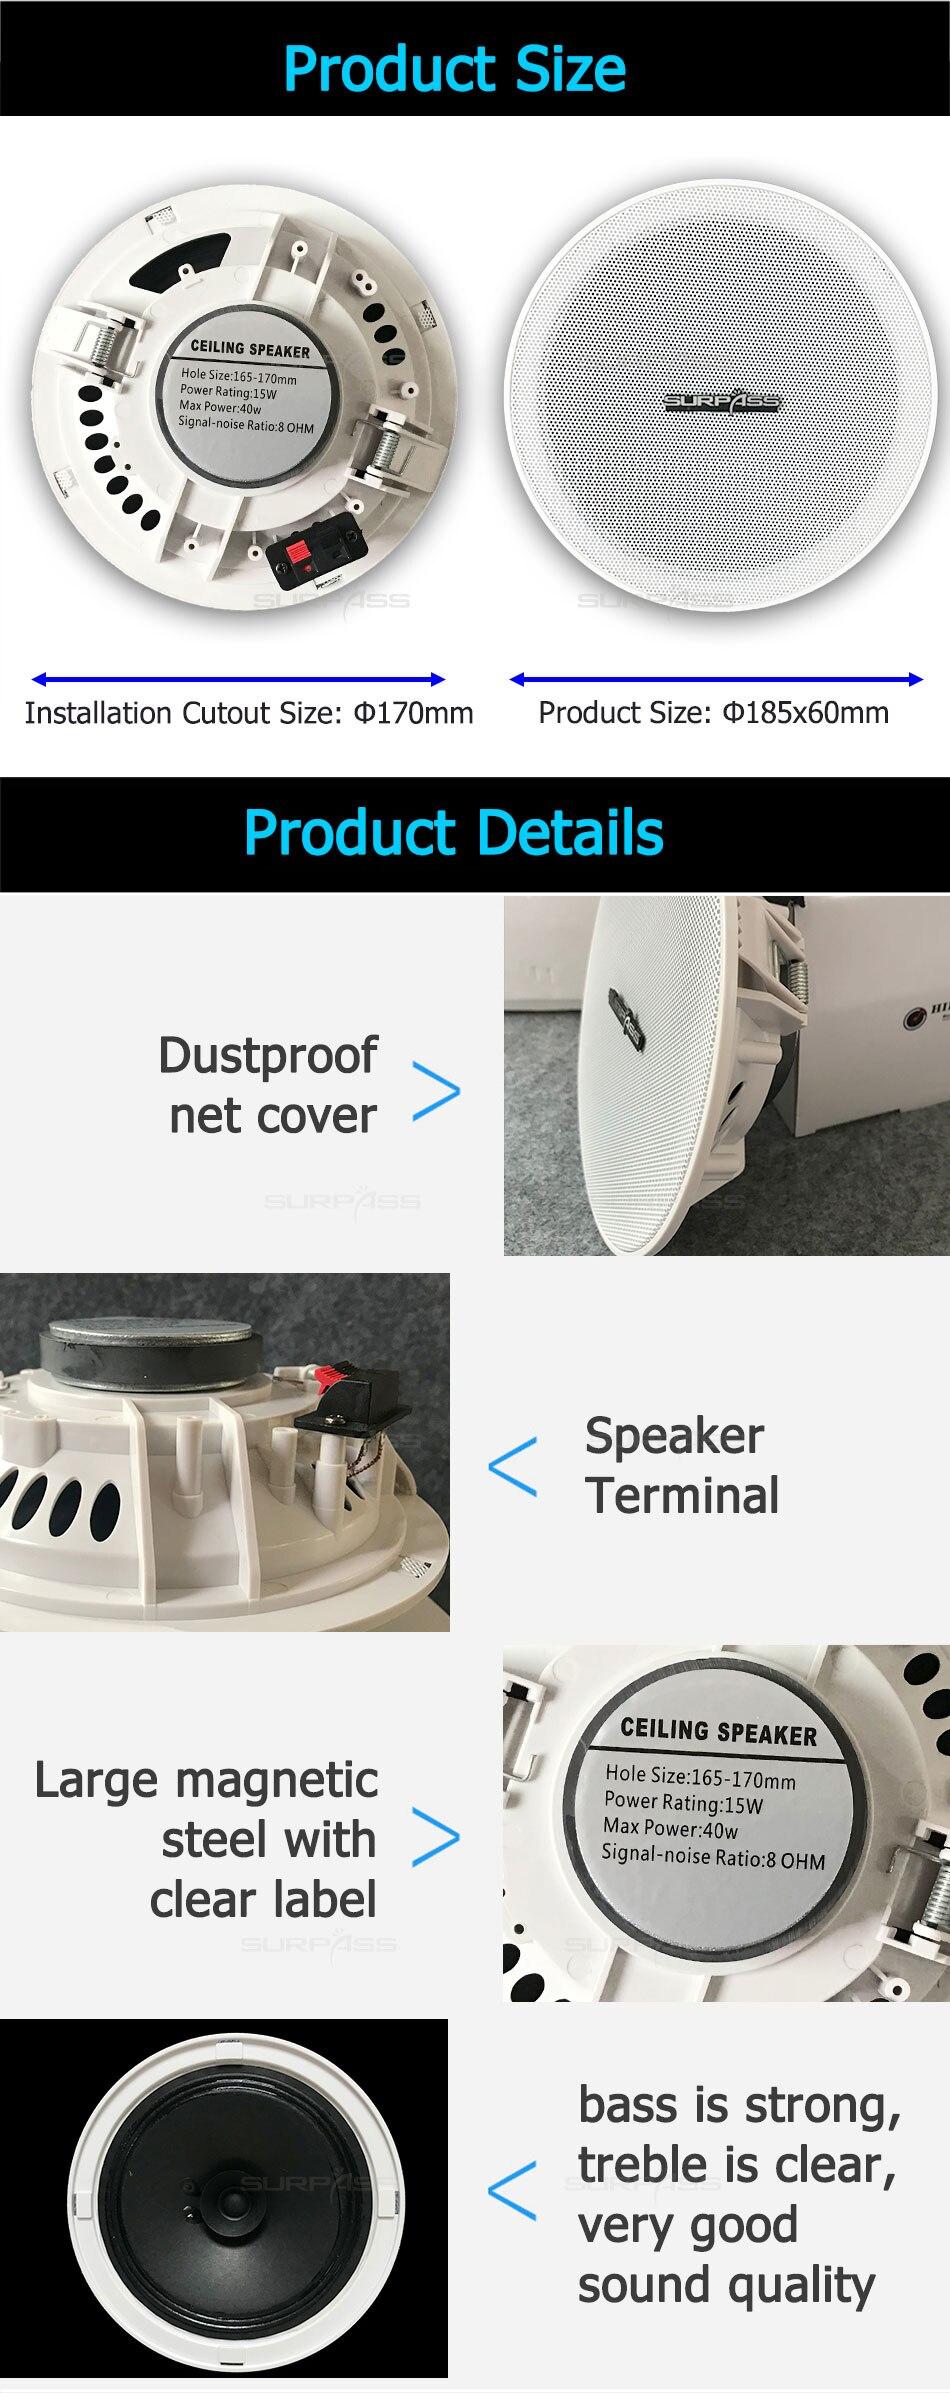 Tanpa Bingkai Sempit 6 Dual Cone Ceiling Speaker Public Address System Instalasi Suara Musik Speaker Di Dinding Pemutar Audio Public Address System Instalasi Suara Aliexpress